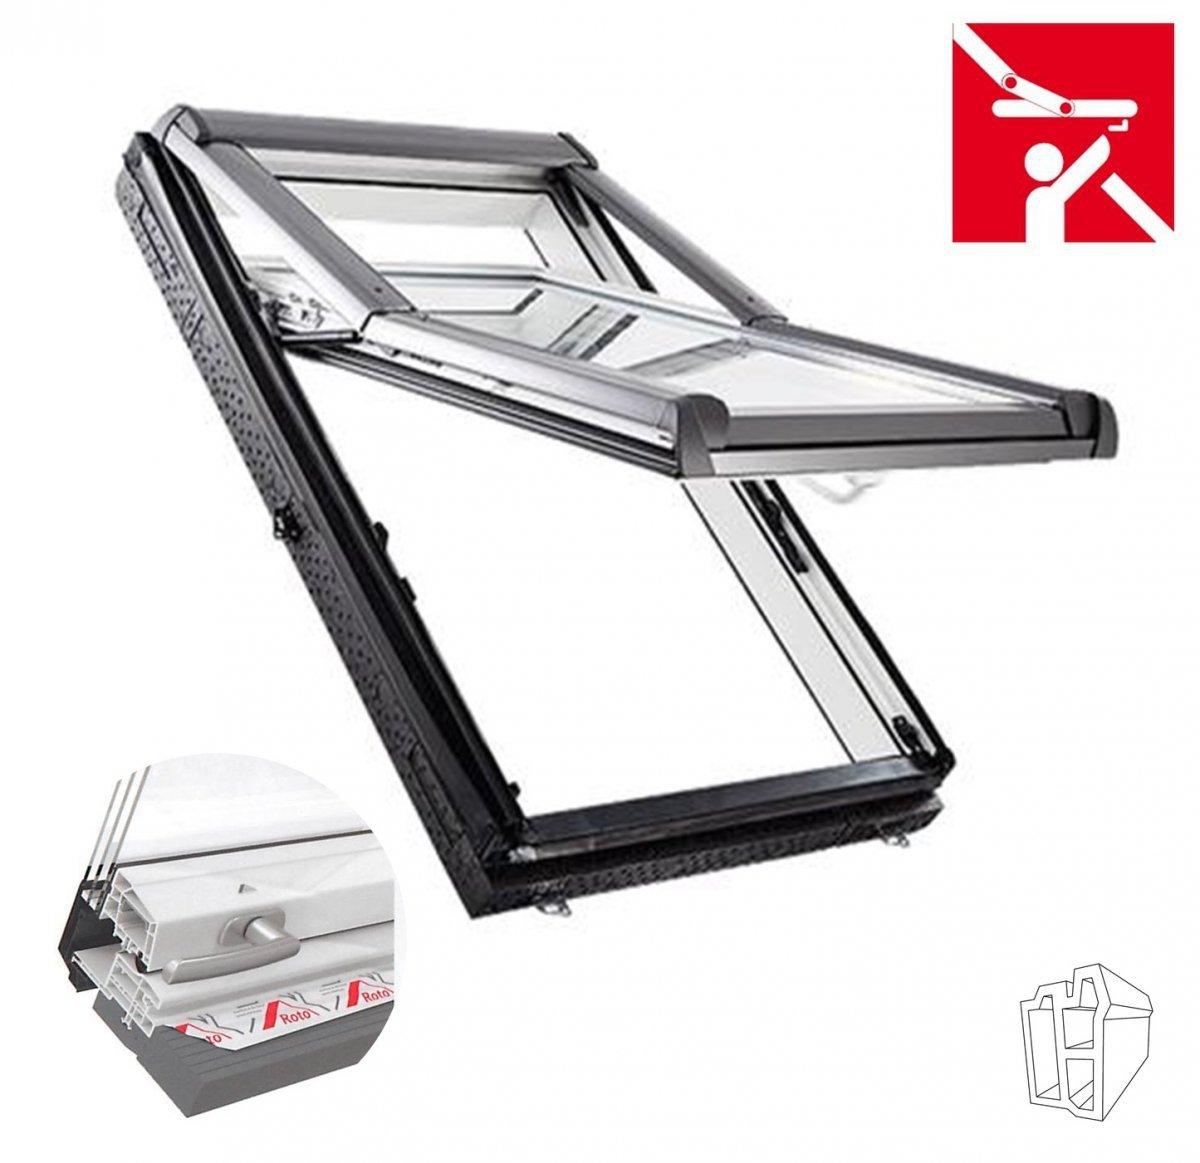 Dachfenster Roto Designo R7 79 K WD 3-fach Verglasung Hoch-Schwingfenster PVC